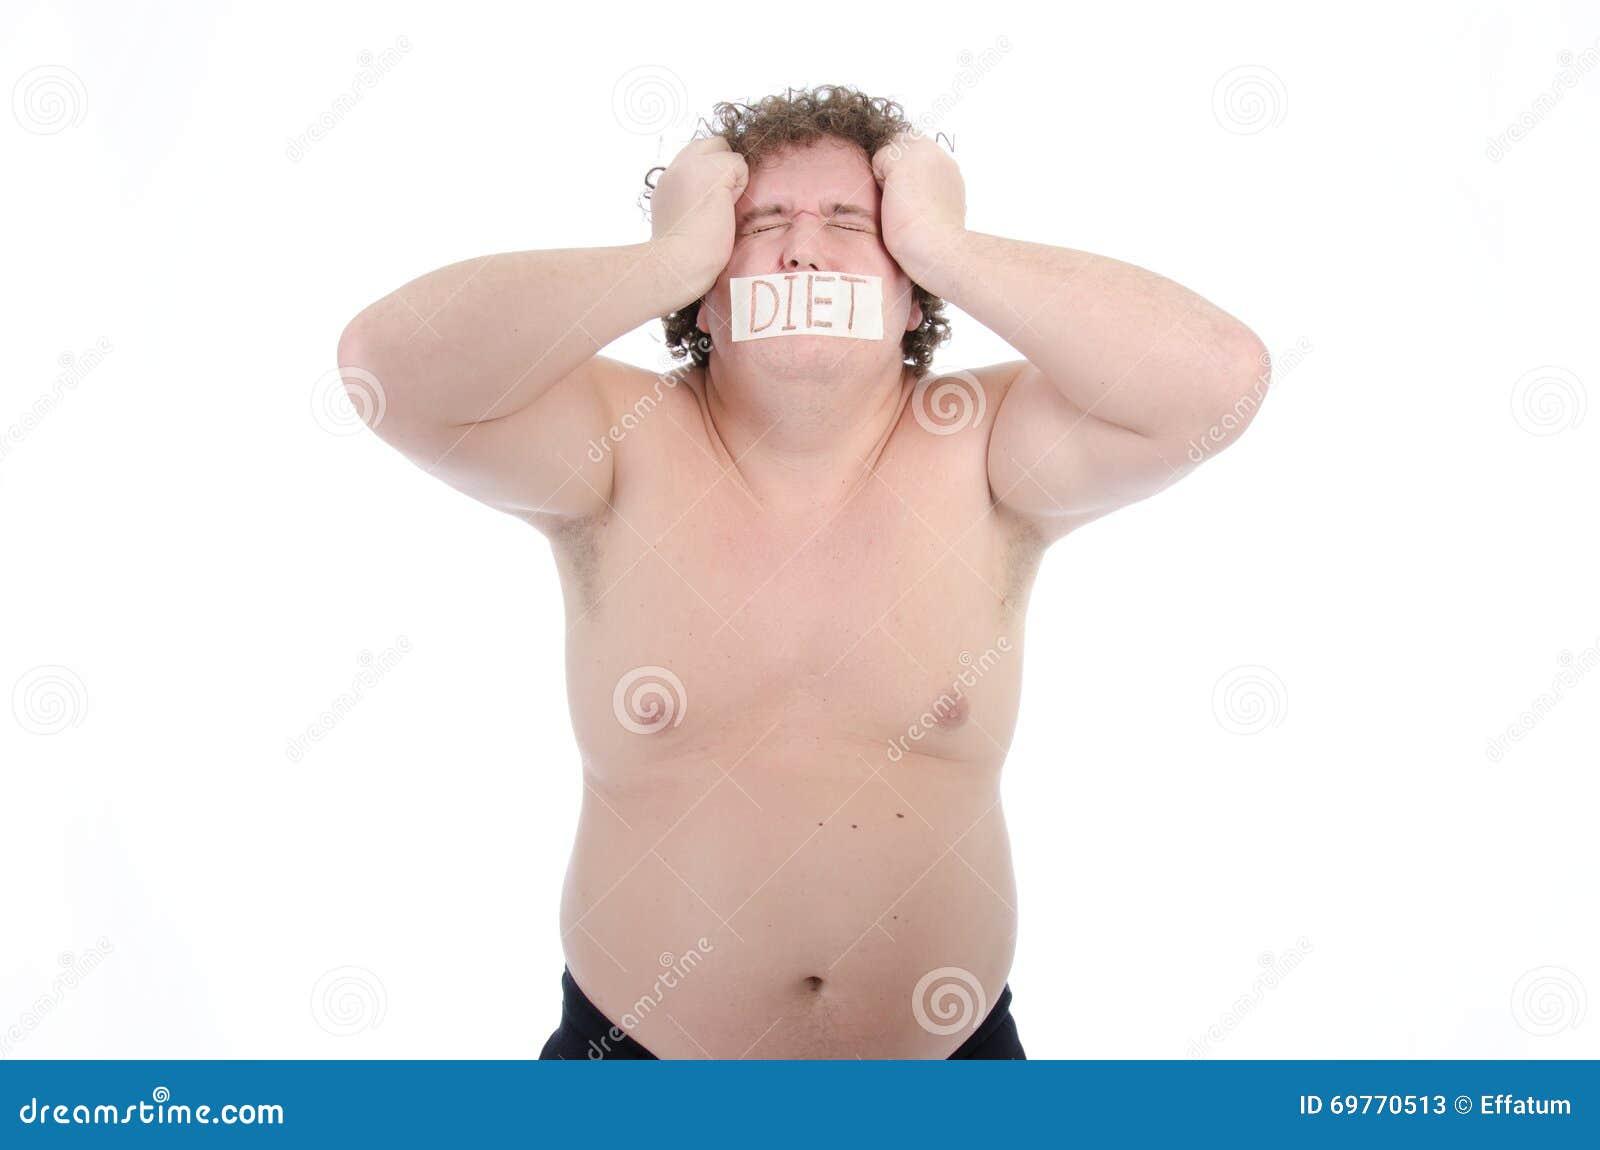 Real skinny mom naked